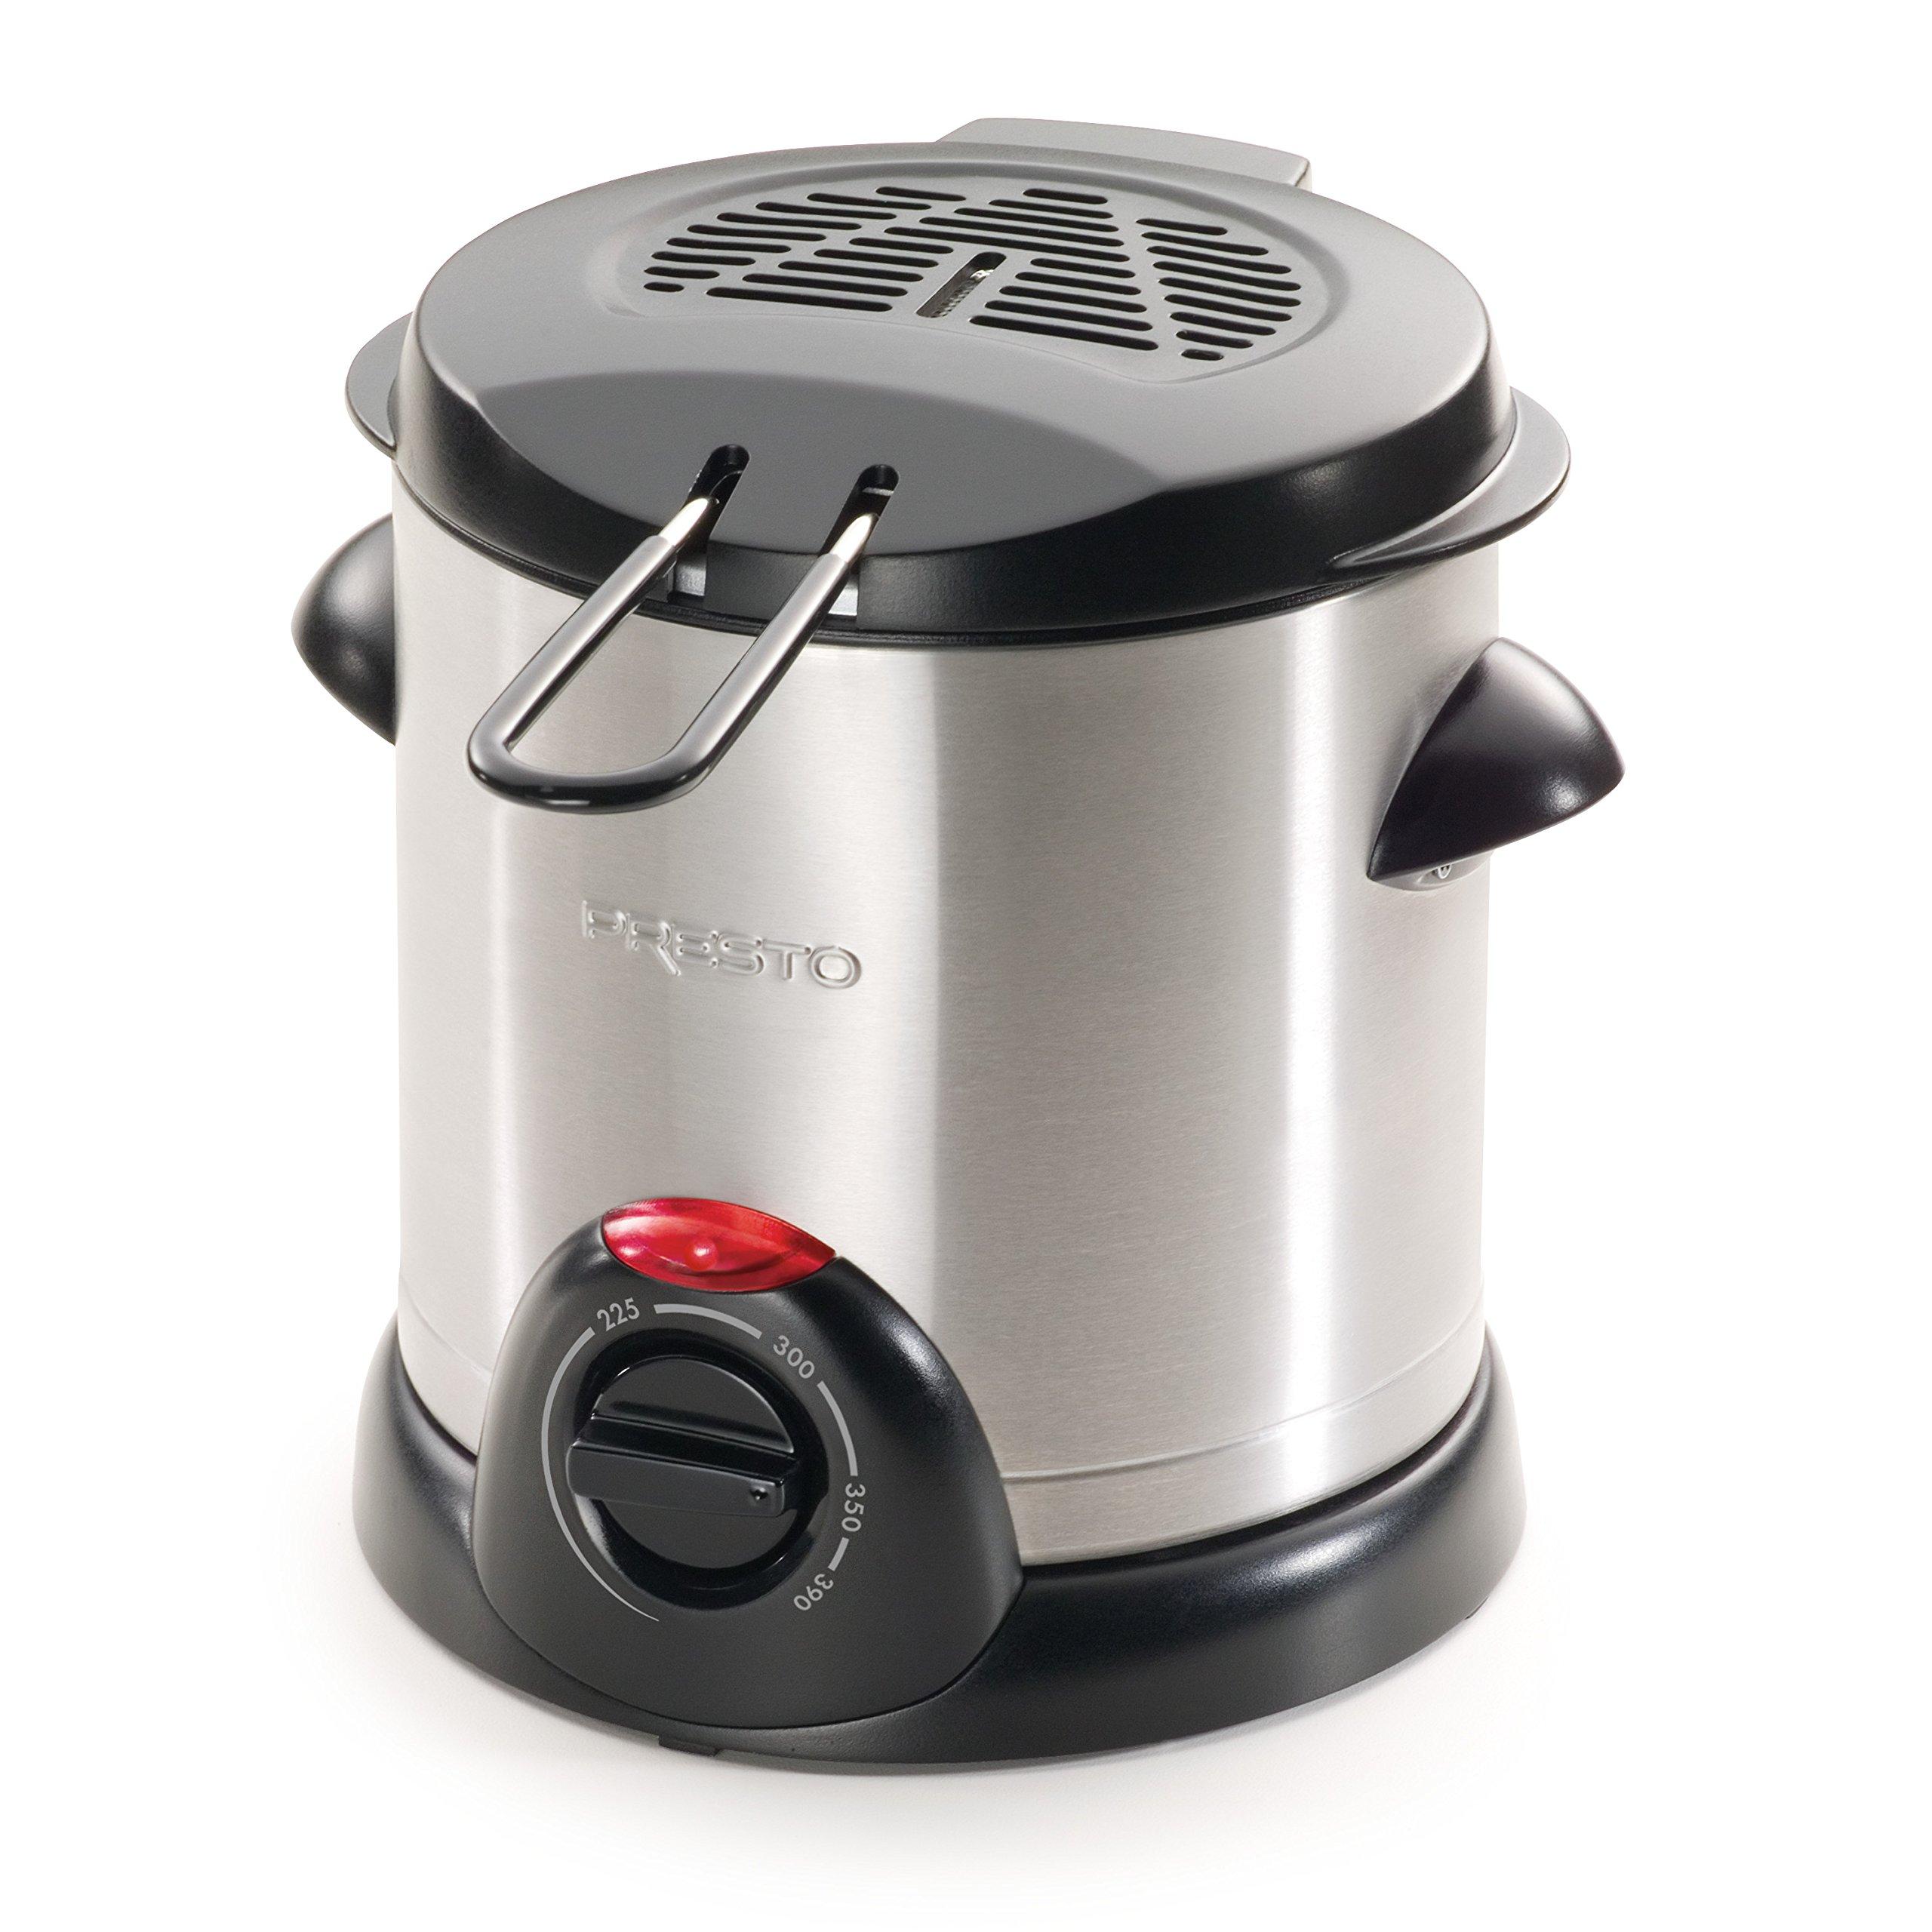 Presto 05470 Stainless Steel Electric Deep Fryer, Silver by Presto